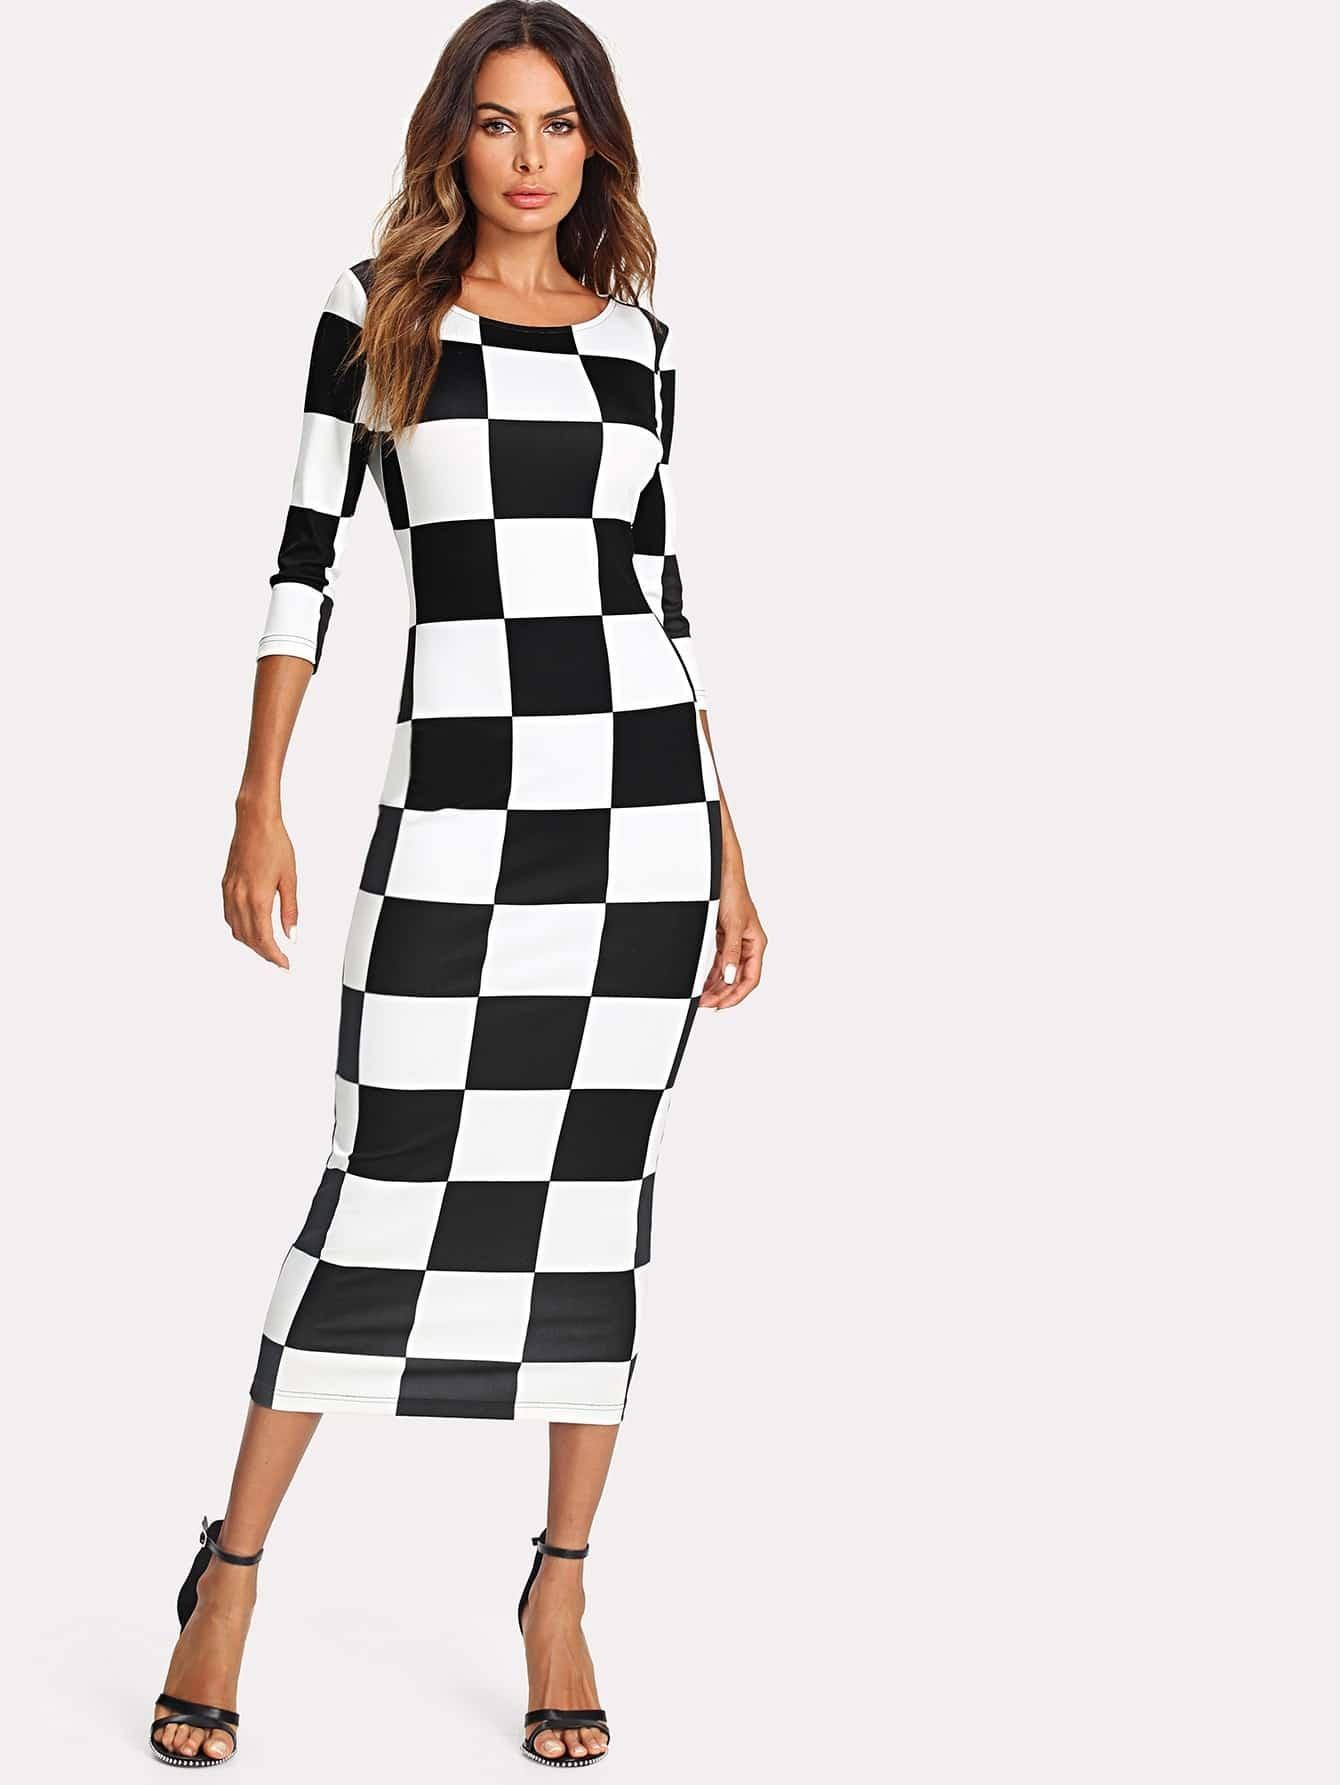 Allover Checkered Print Pencil Dress allover bear print dress